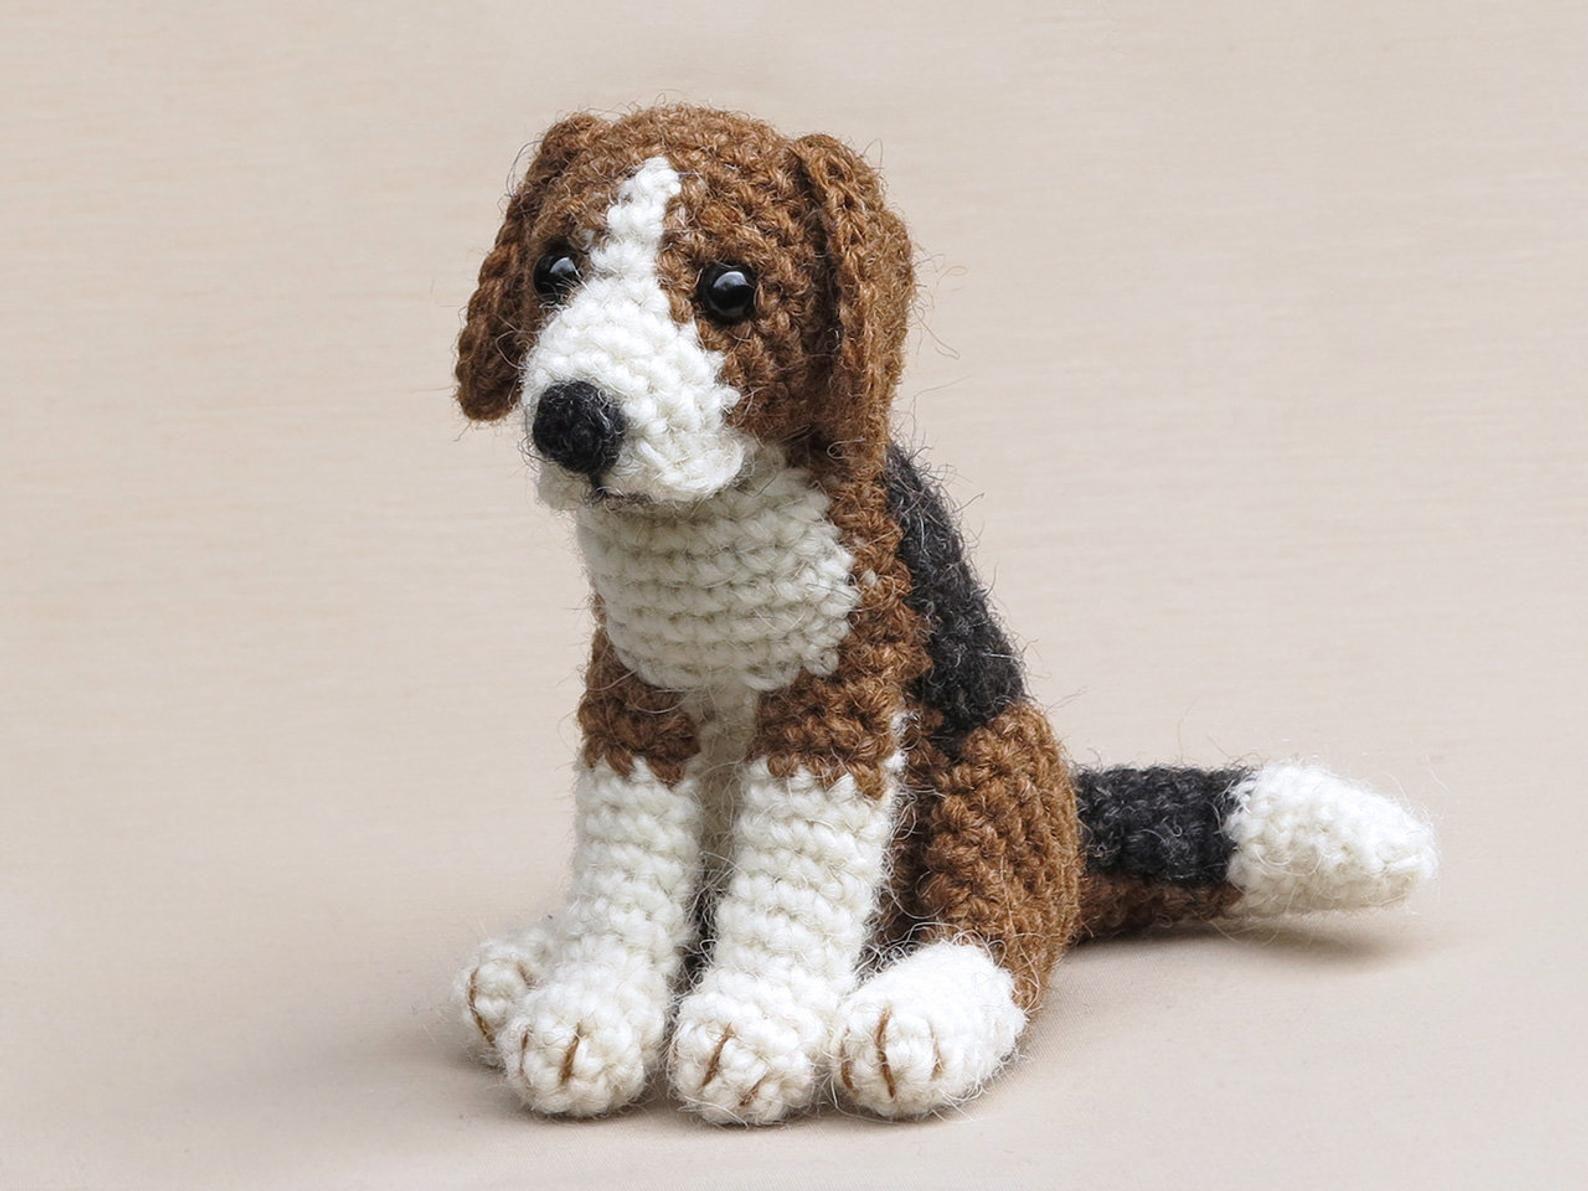 Hambea Realistic Crochet Beagle Dog Amigurumi Pattern Etsy In 2021 Stuffed Animal Patterns Crochet Dog Beagle Dog [ 1191 x 1588 Pixel ]